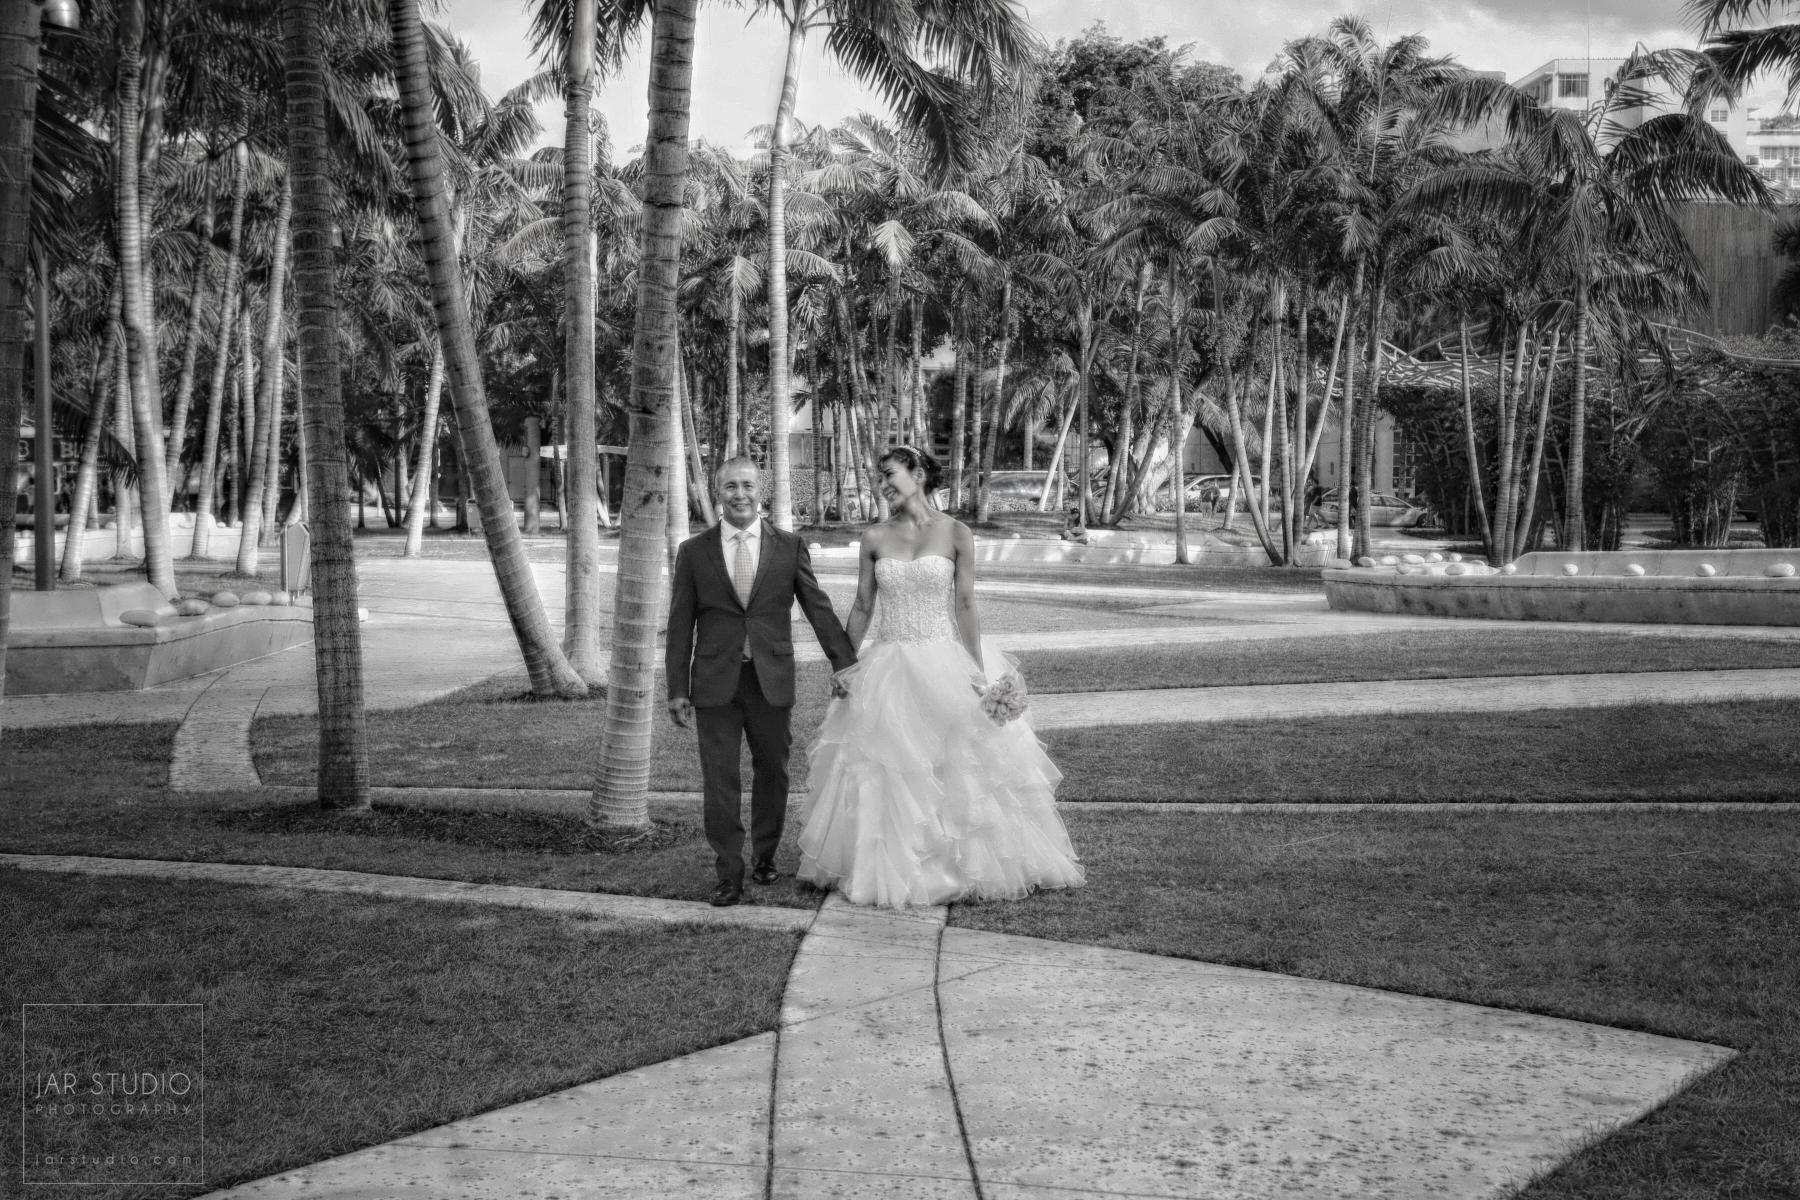 13-disney-asian-wedding-photographer.JPG